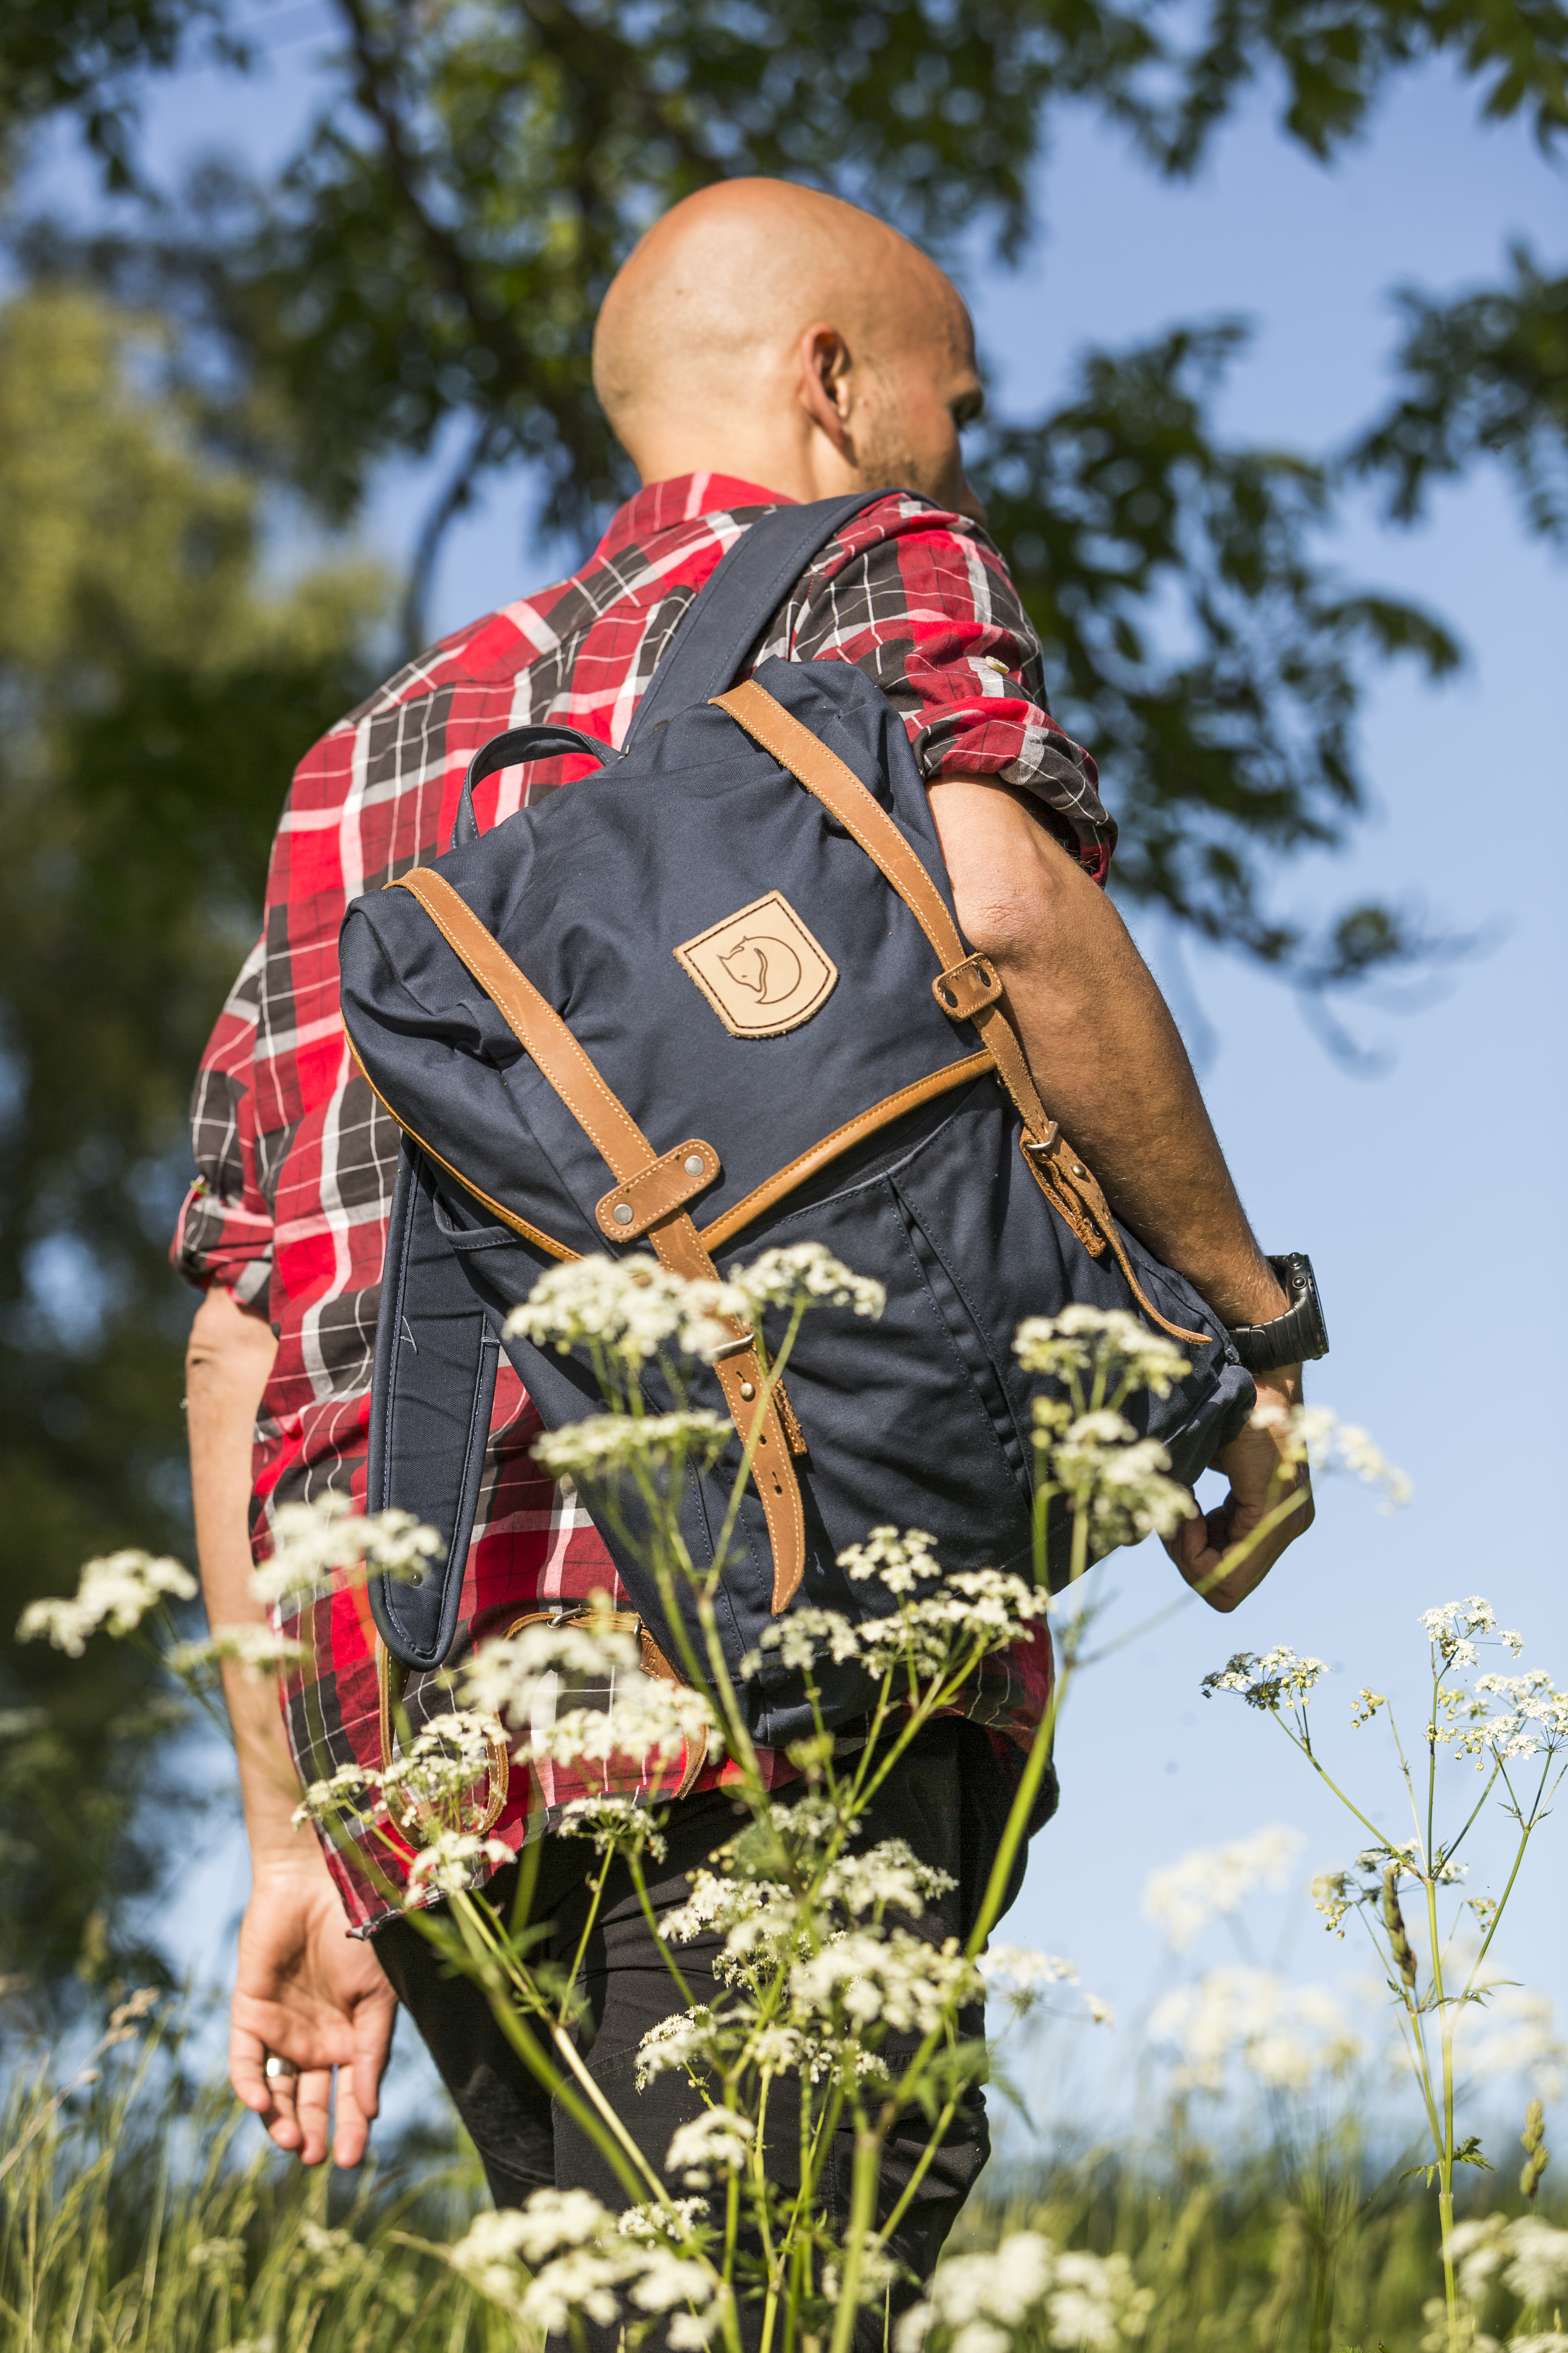 ryggsack 24 b   Outdoors Life